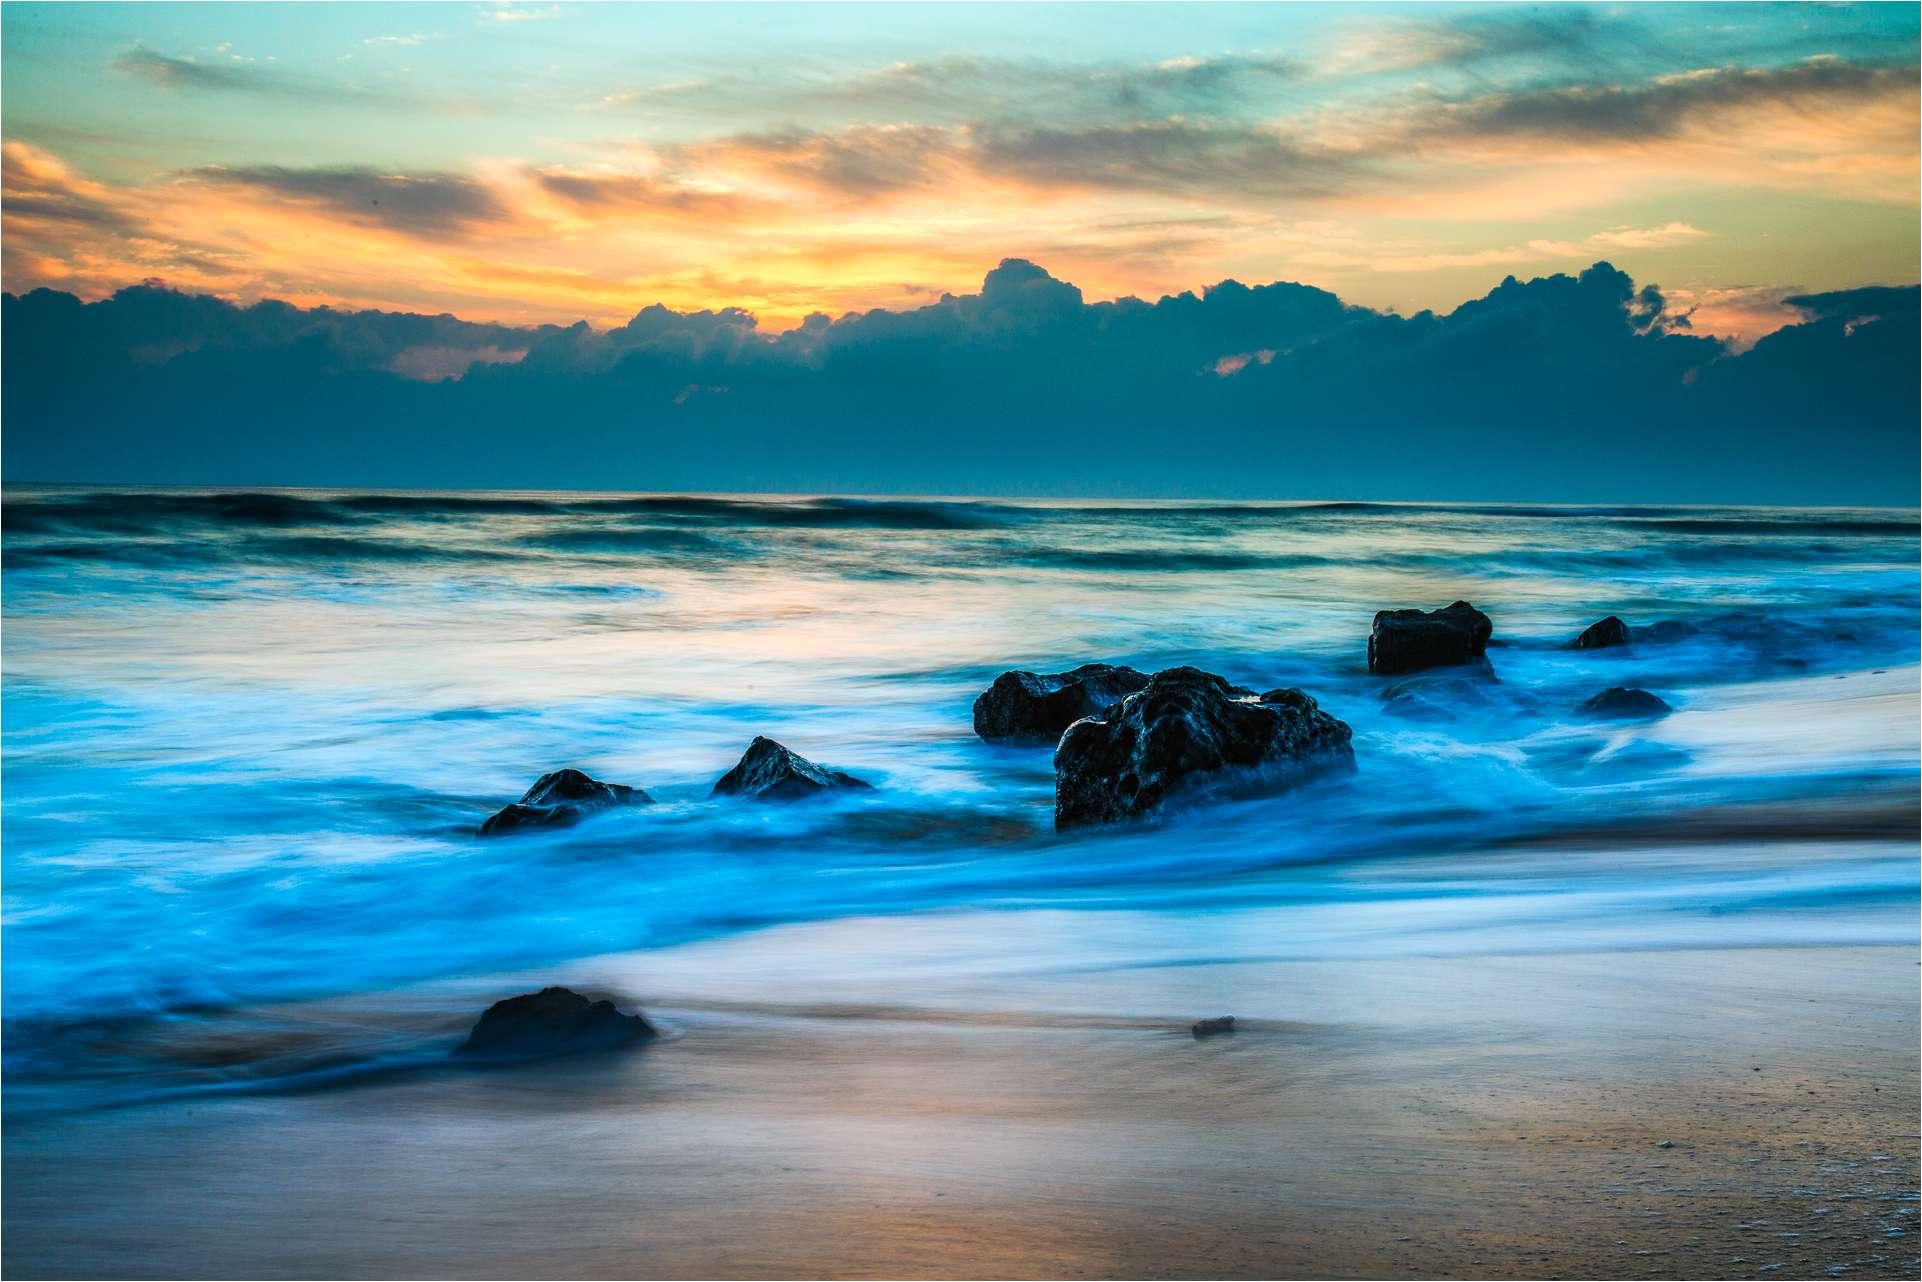 Hawaii Christopher Martin Photography